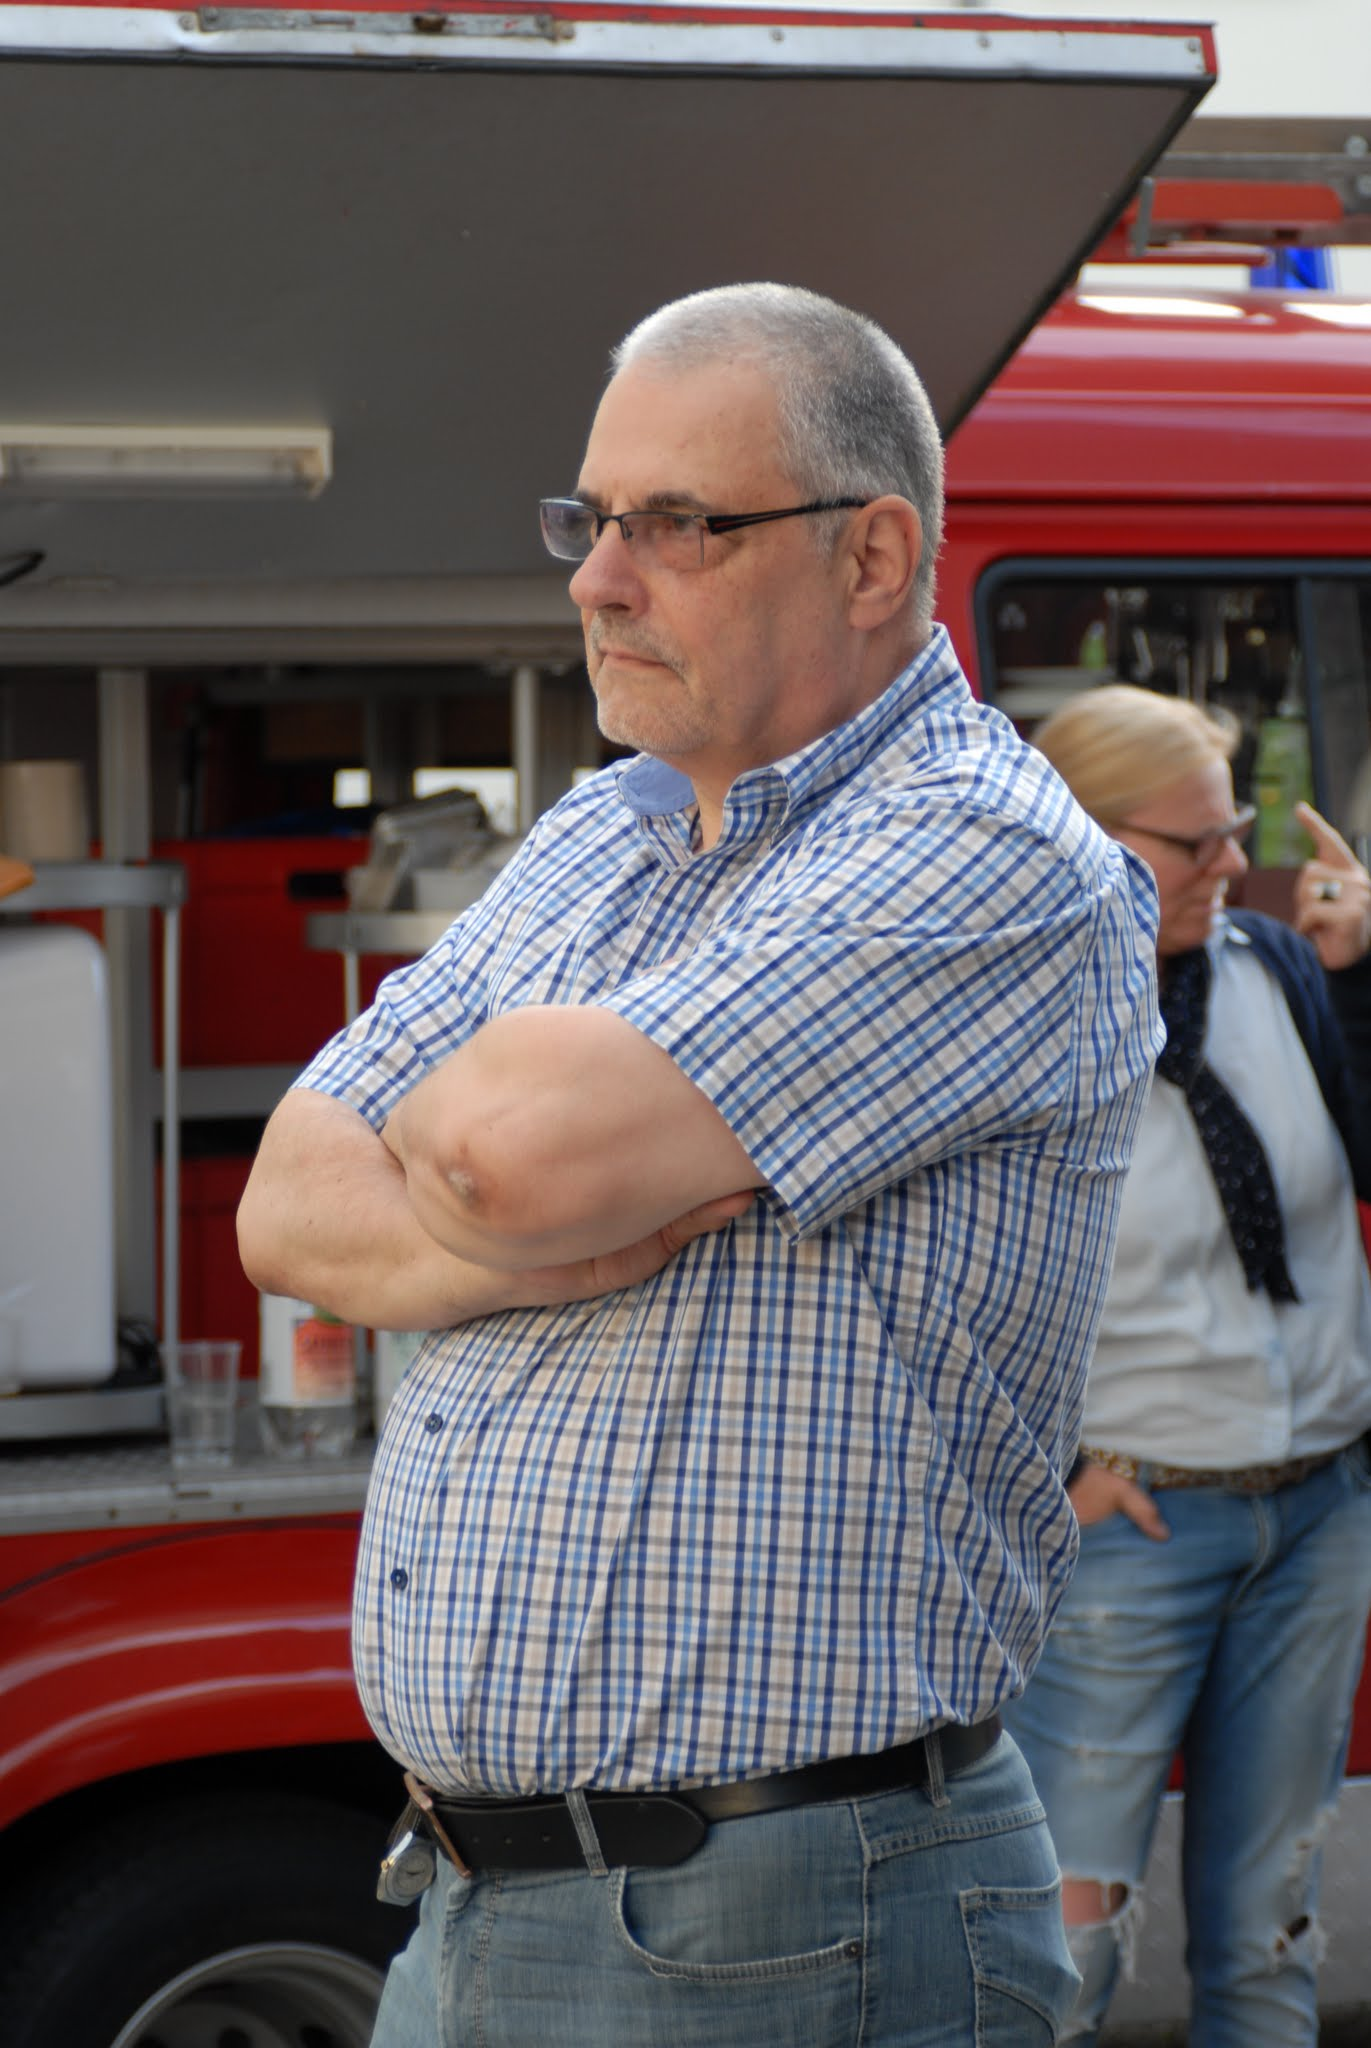 Geburtstags-Ständchen Hanspeter Schmid am 1. Juli 2014